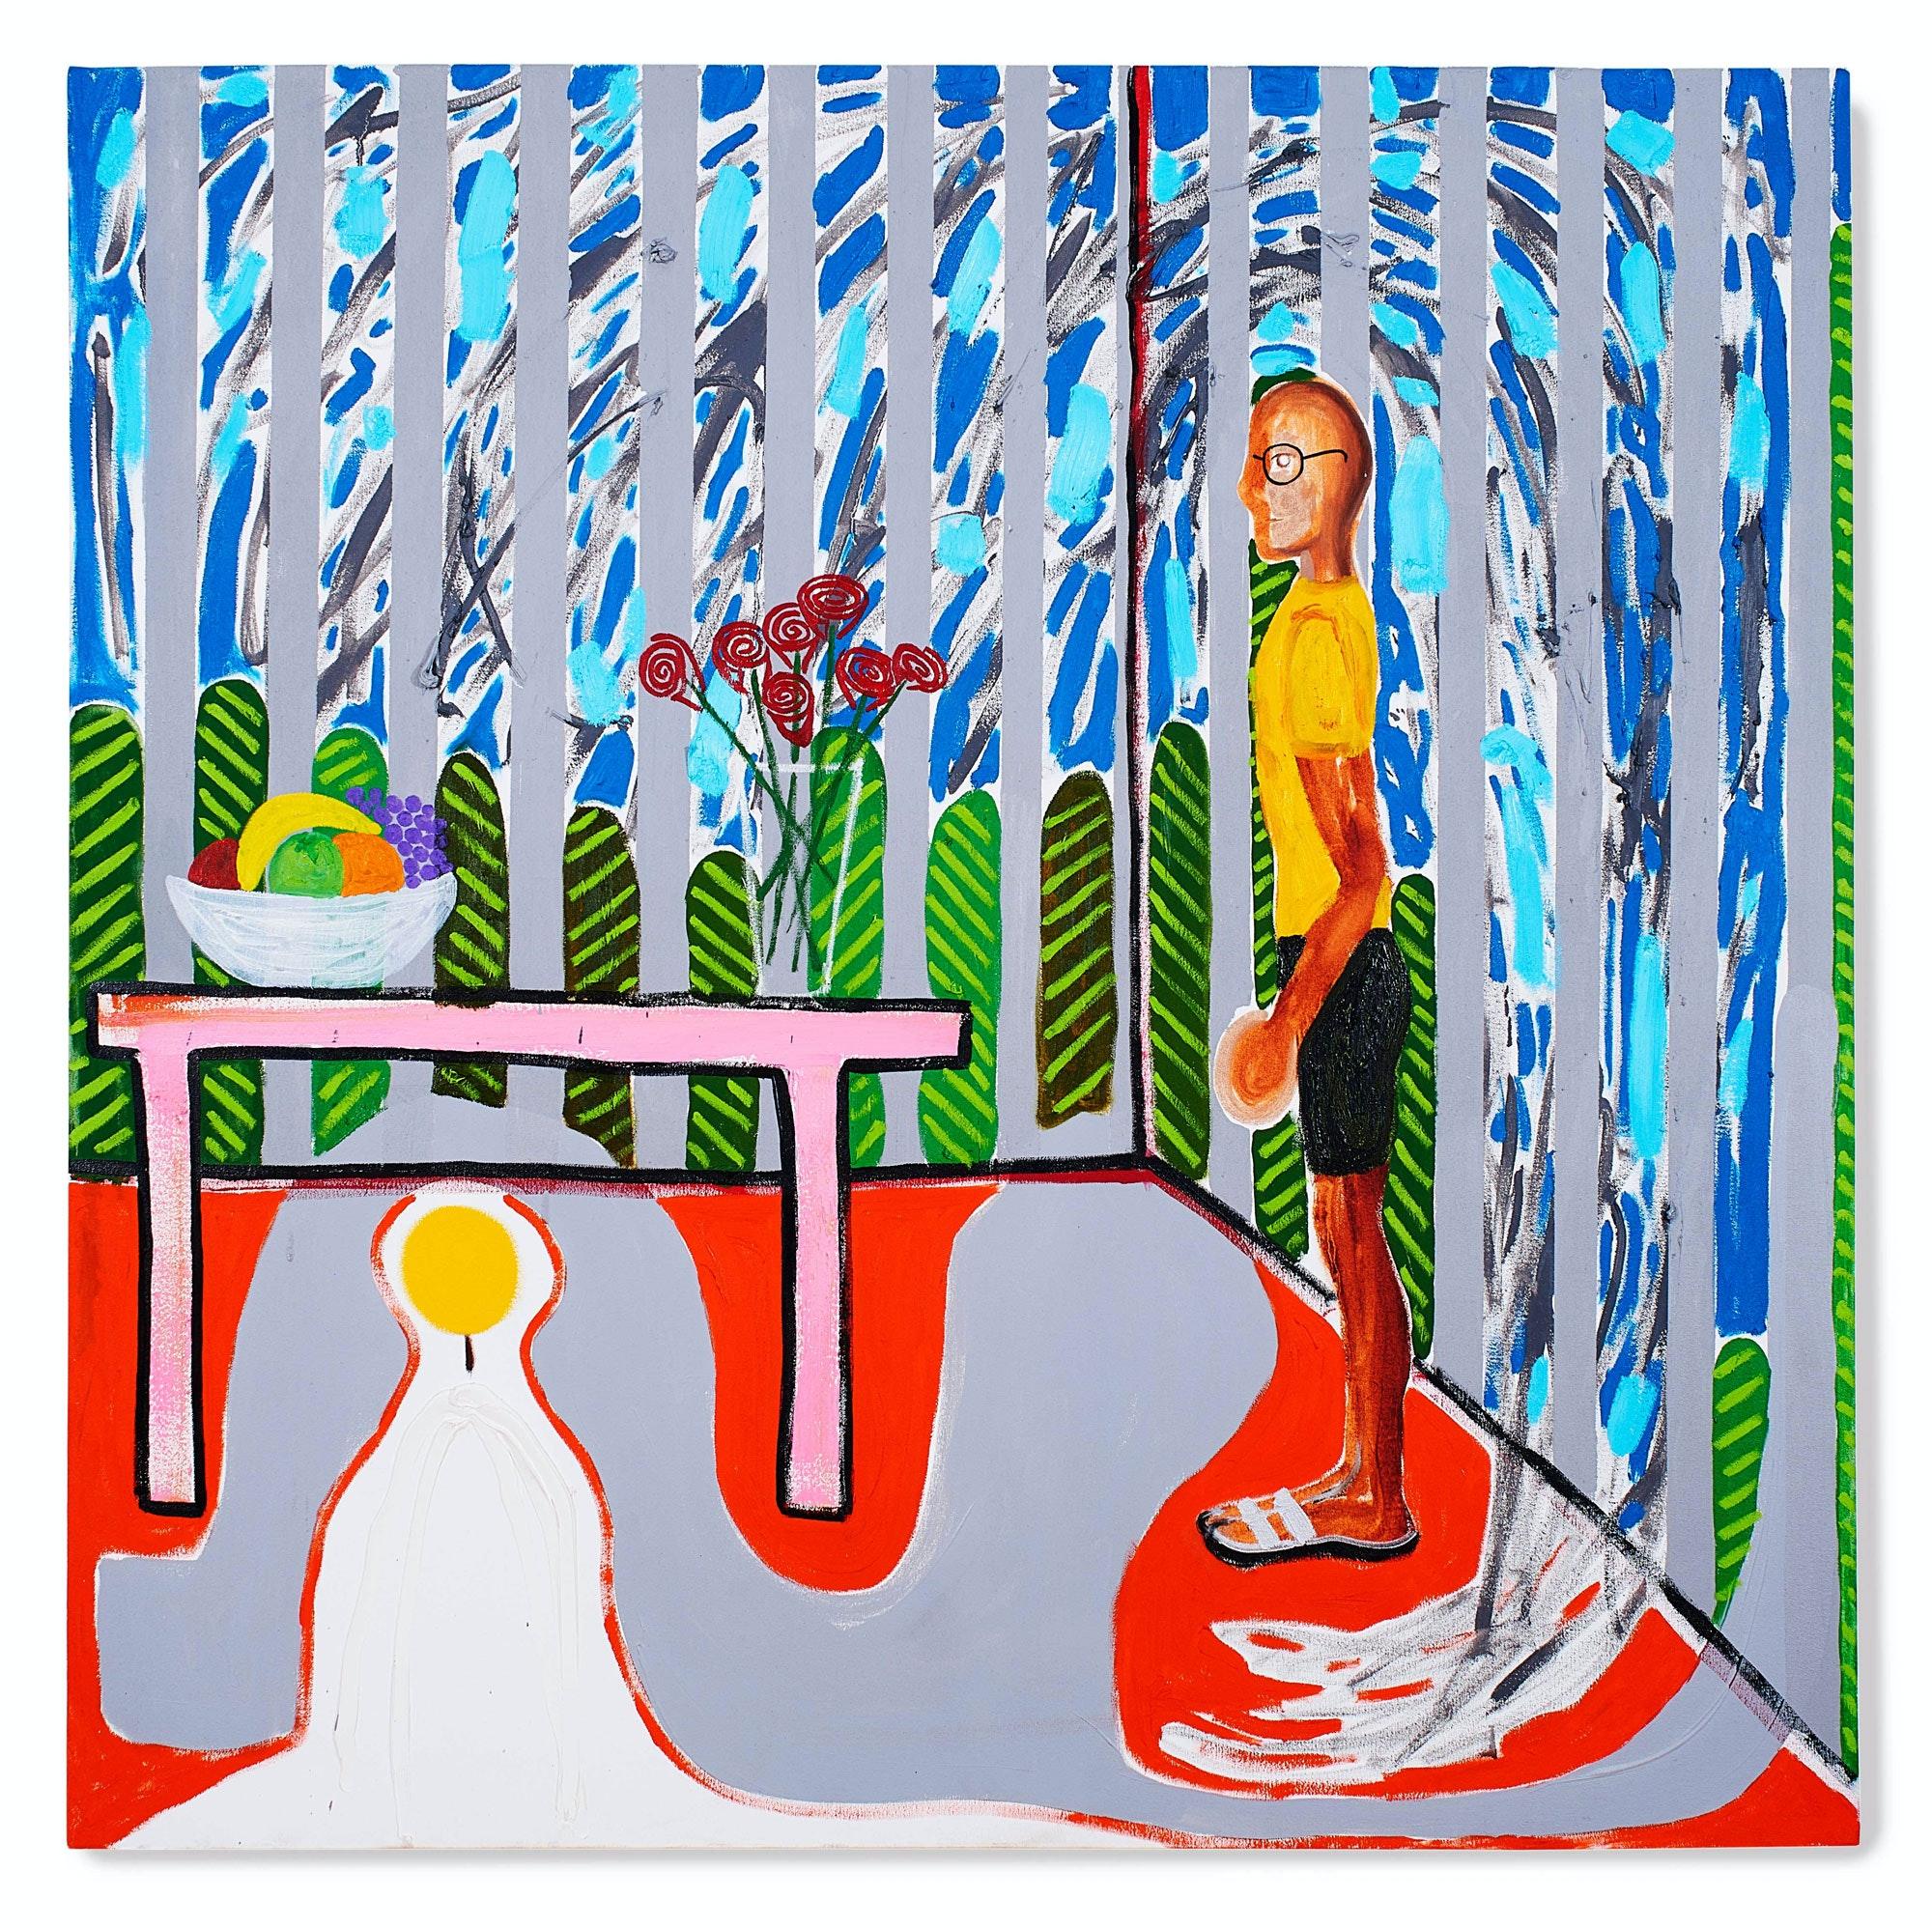 Sinéad Breslin, <em>Arfus</em>, 2017. Oil on canvas, 47 x 47 inches. Courtesy Marc Straus.